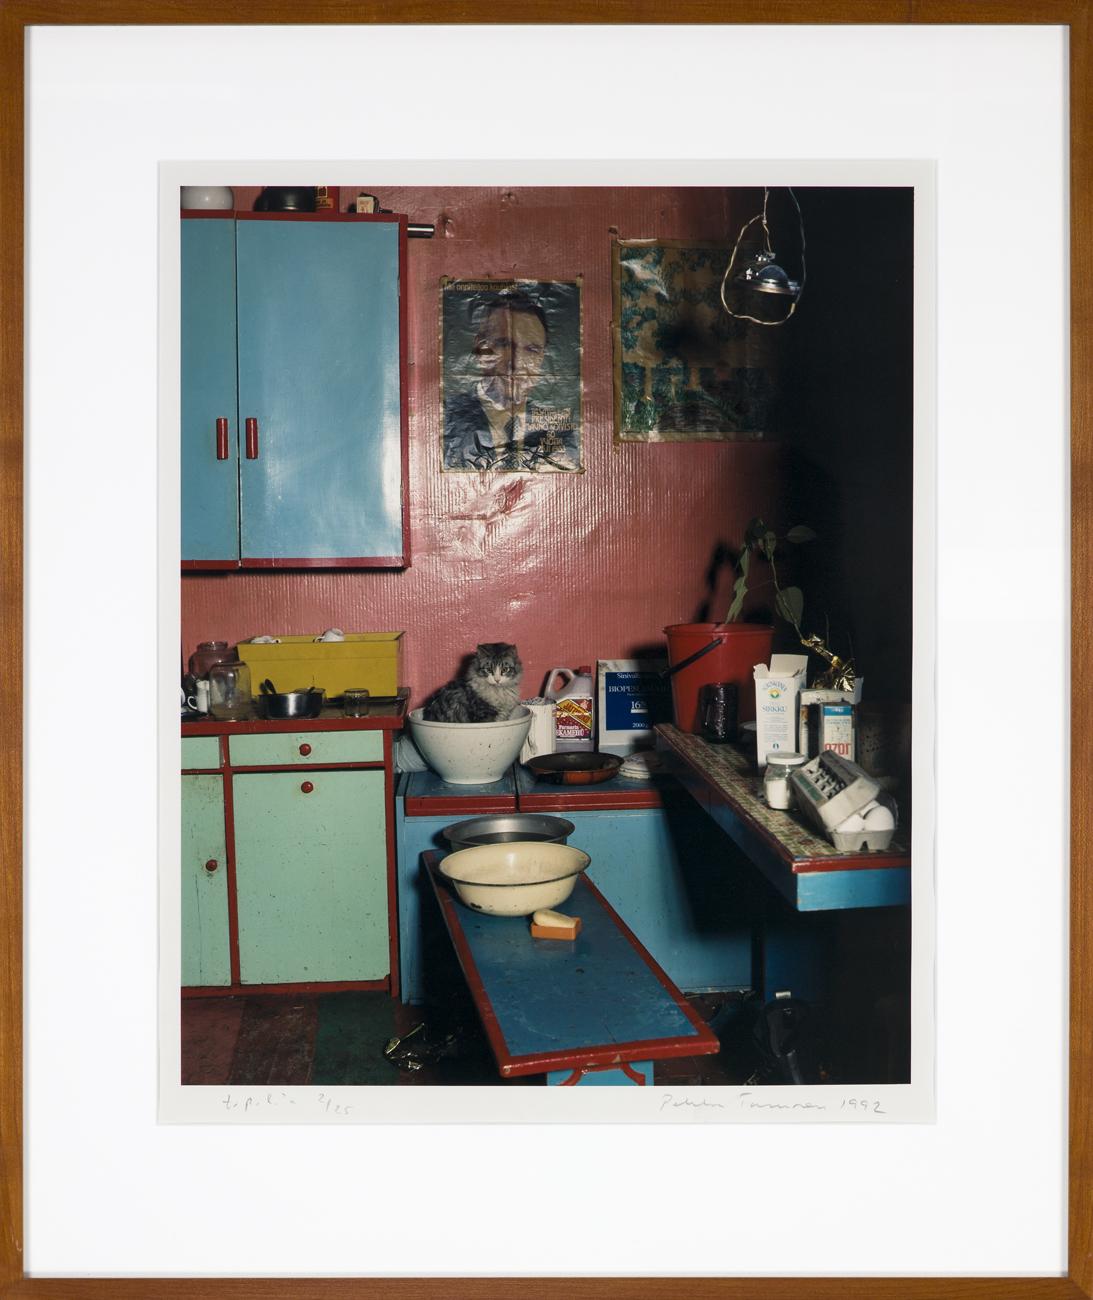 Pekka Turunen  En katt i en skål  1992 C-print, 2/25 45,5 x 37 cm